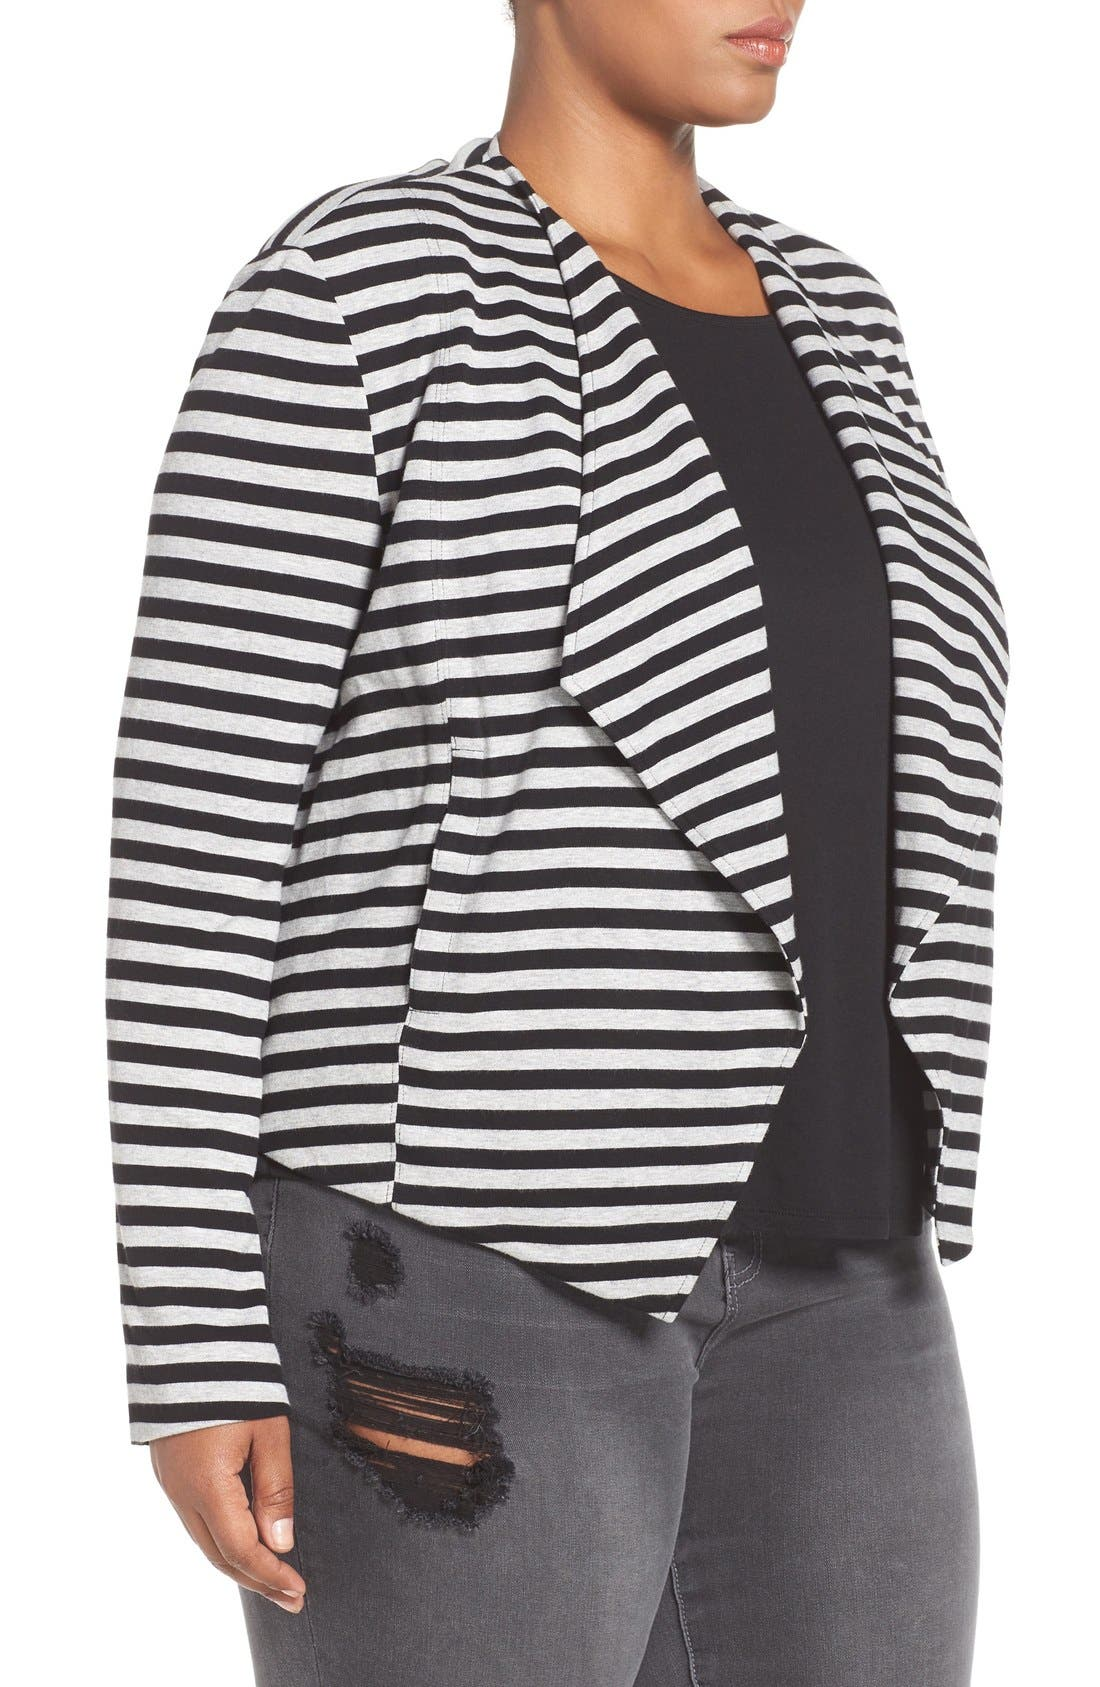 'Veronicka' Stripe Knit Open Front Jacket,                             Alternate thumbnail 3, color,                             BLACK/ HEATHER GREY STRIPE